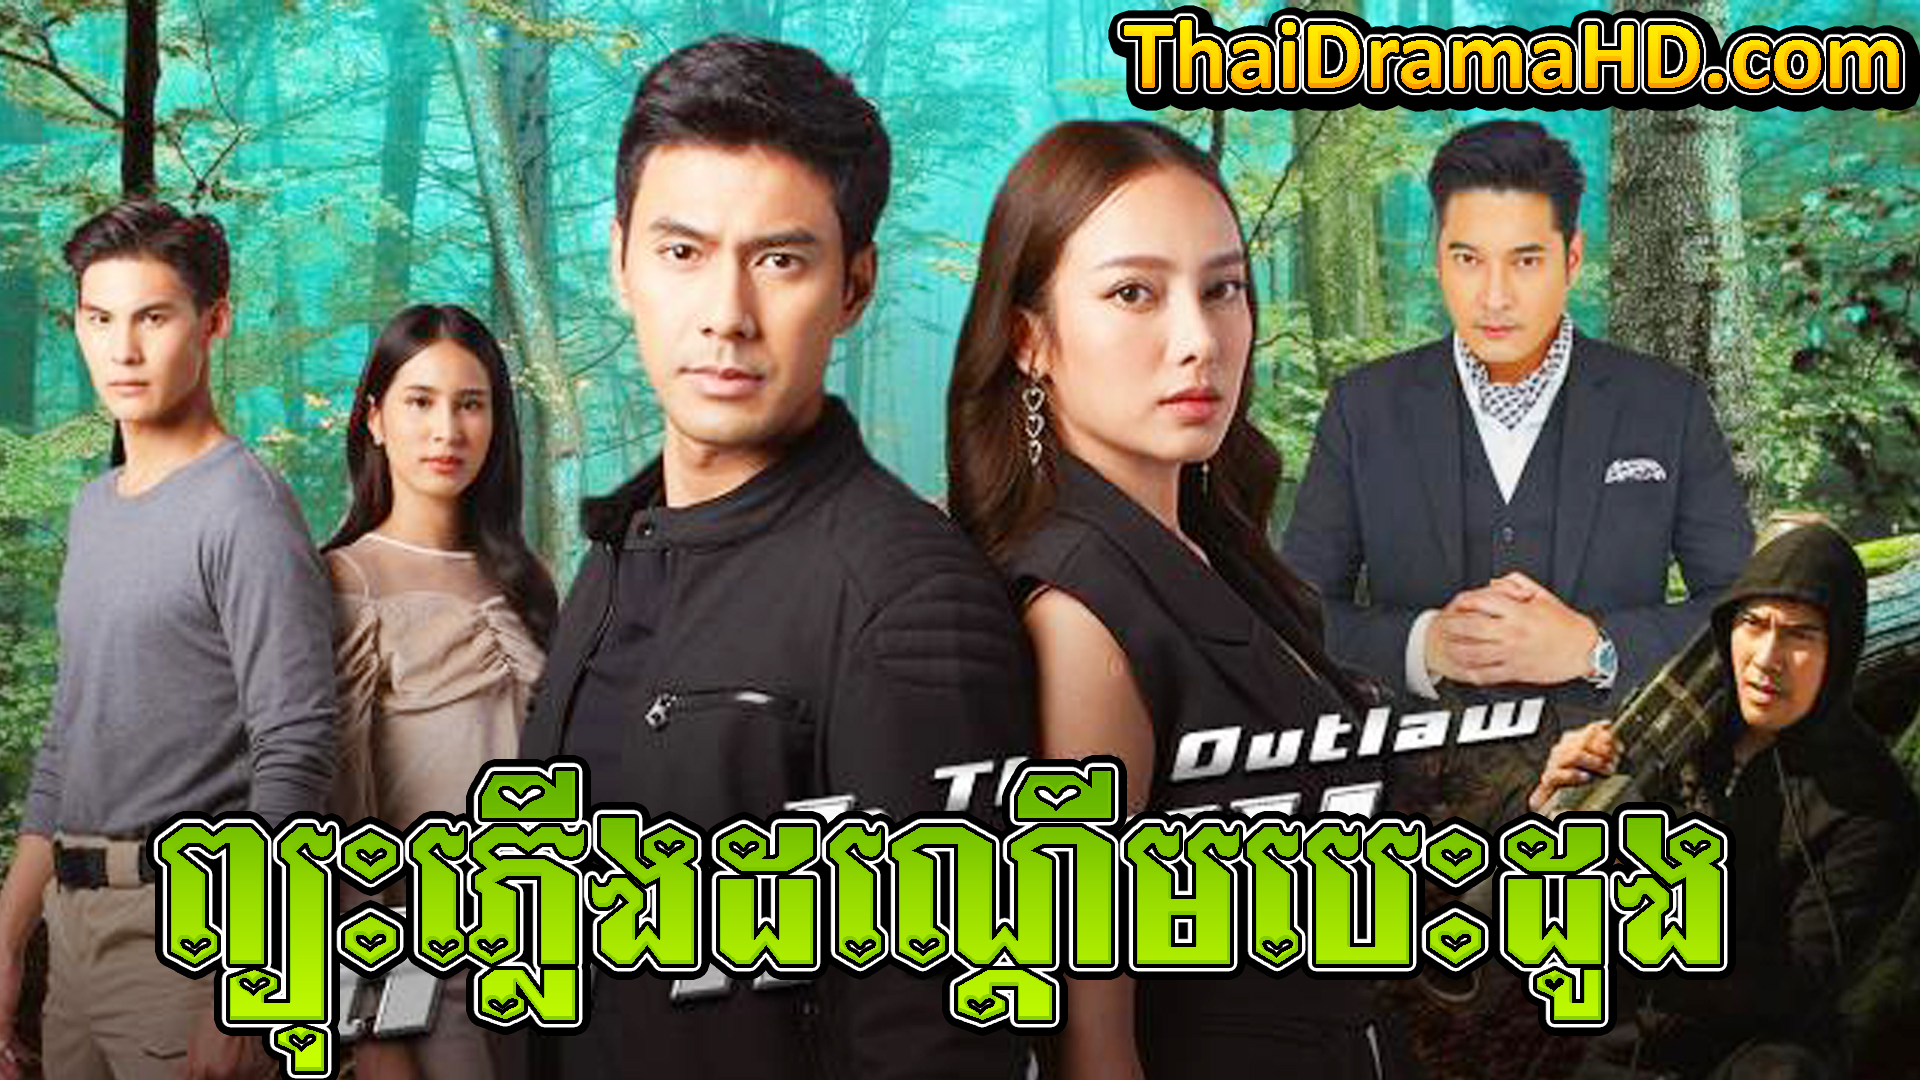 Pyouh Phleung Dandeum Besdong, Thai Drama, Thai Drama HD, Khmer Movie, Phumikhmer, Phumikhmer1, movie-khmer, video4khmer, video4khmer36, khmotions, kolab-khmer, kolab khmer, watch khmer drama, ksdrama, cookingtips, roscheat, khmertimeskh, khmerkomsan, phumi7, merlkon, film2us, movie2kh, sweetdrama, khmercitylove, khreplay, tvb cambodia drama, ckh7, srokthai, phumimedia, phumi8, khmer avenue, khmer search, Soyo, khmerfans